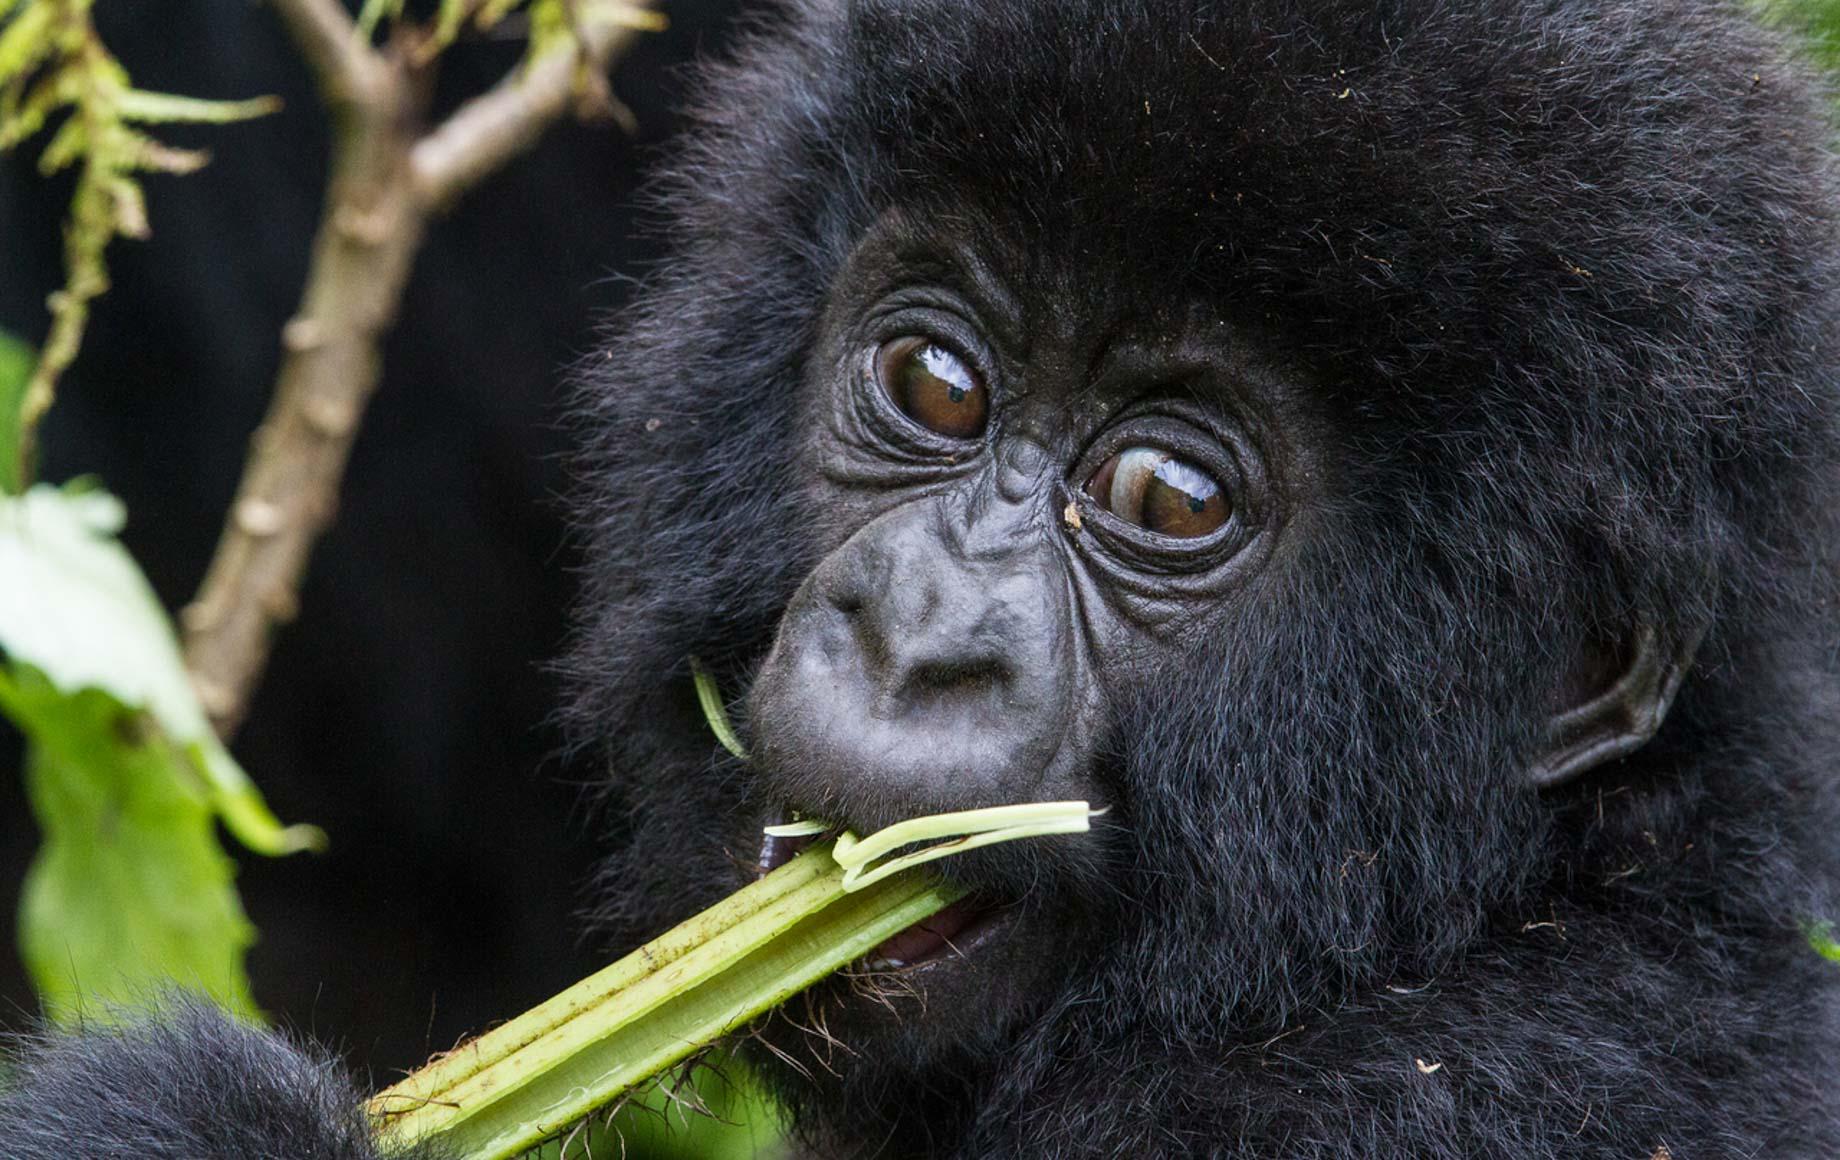 Monkey eating tree at African Safari